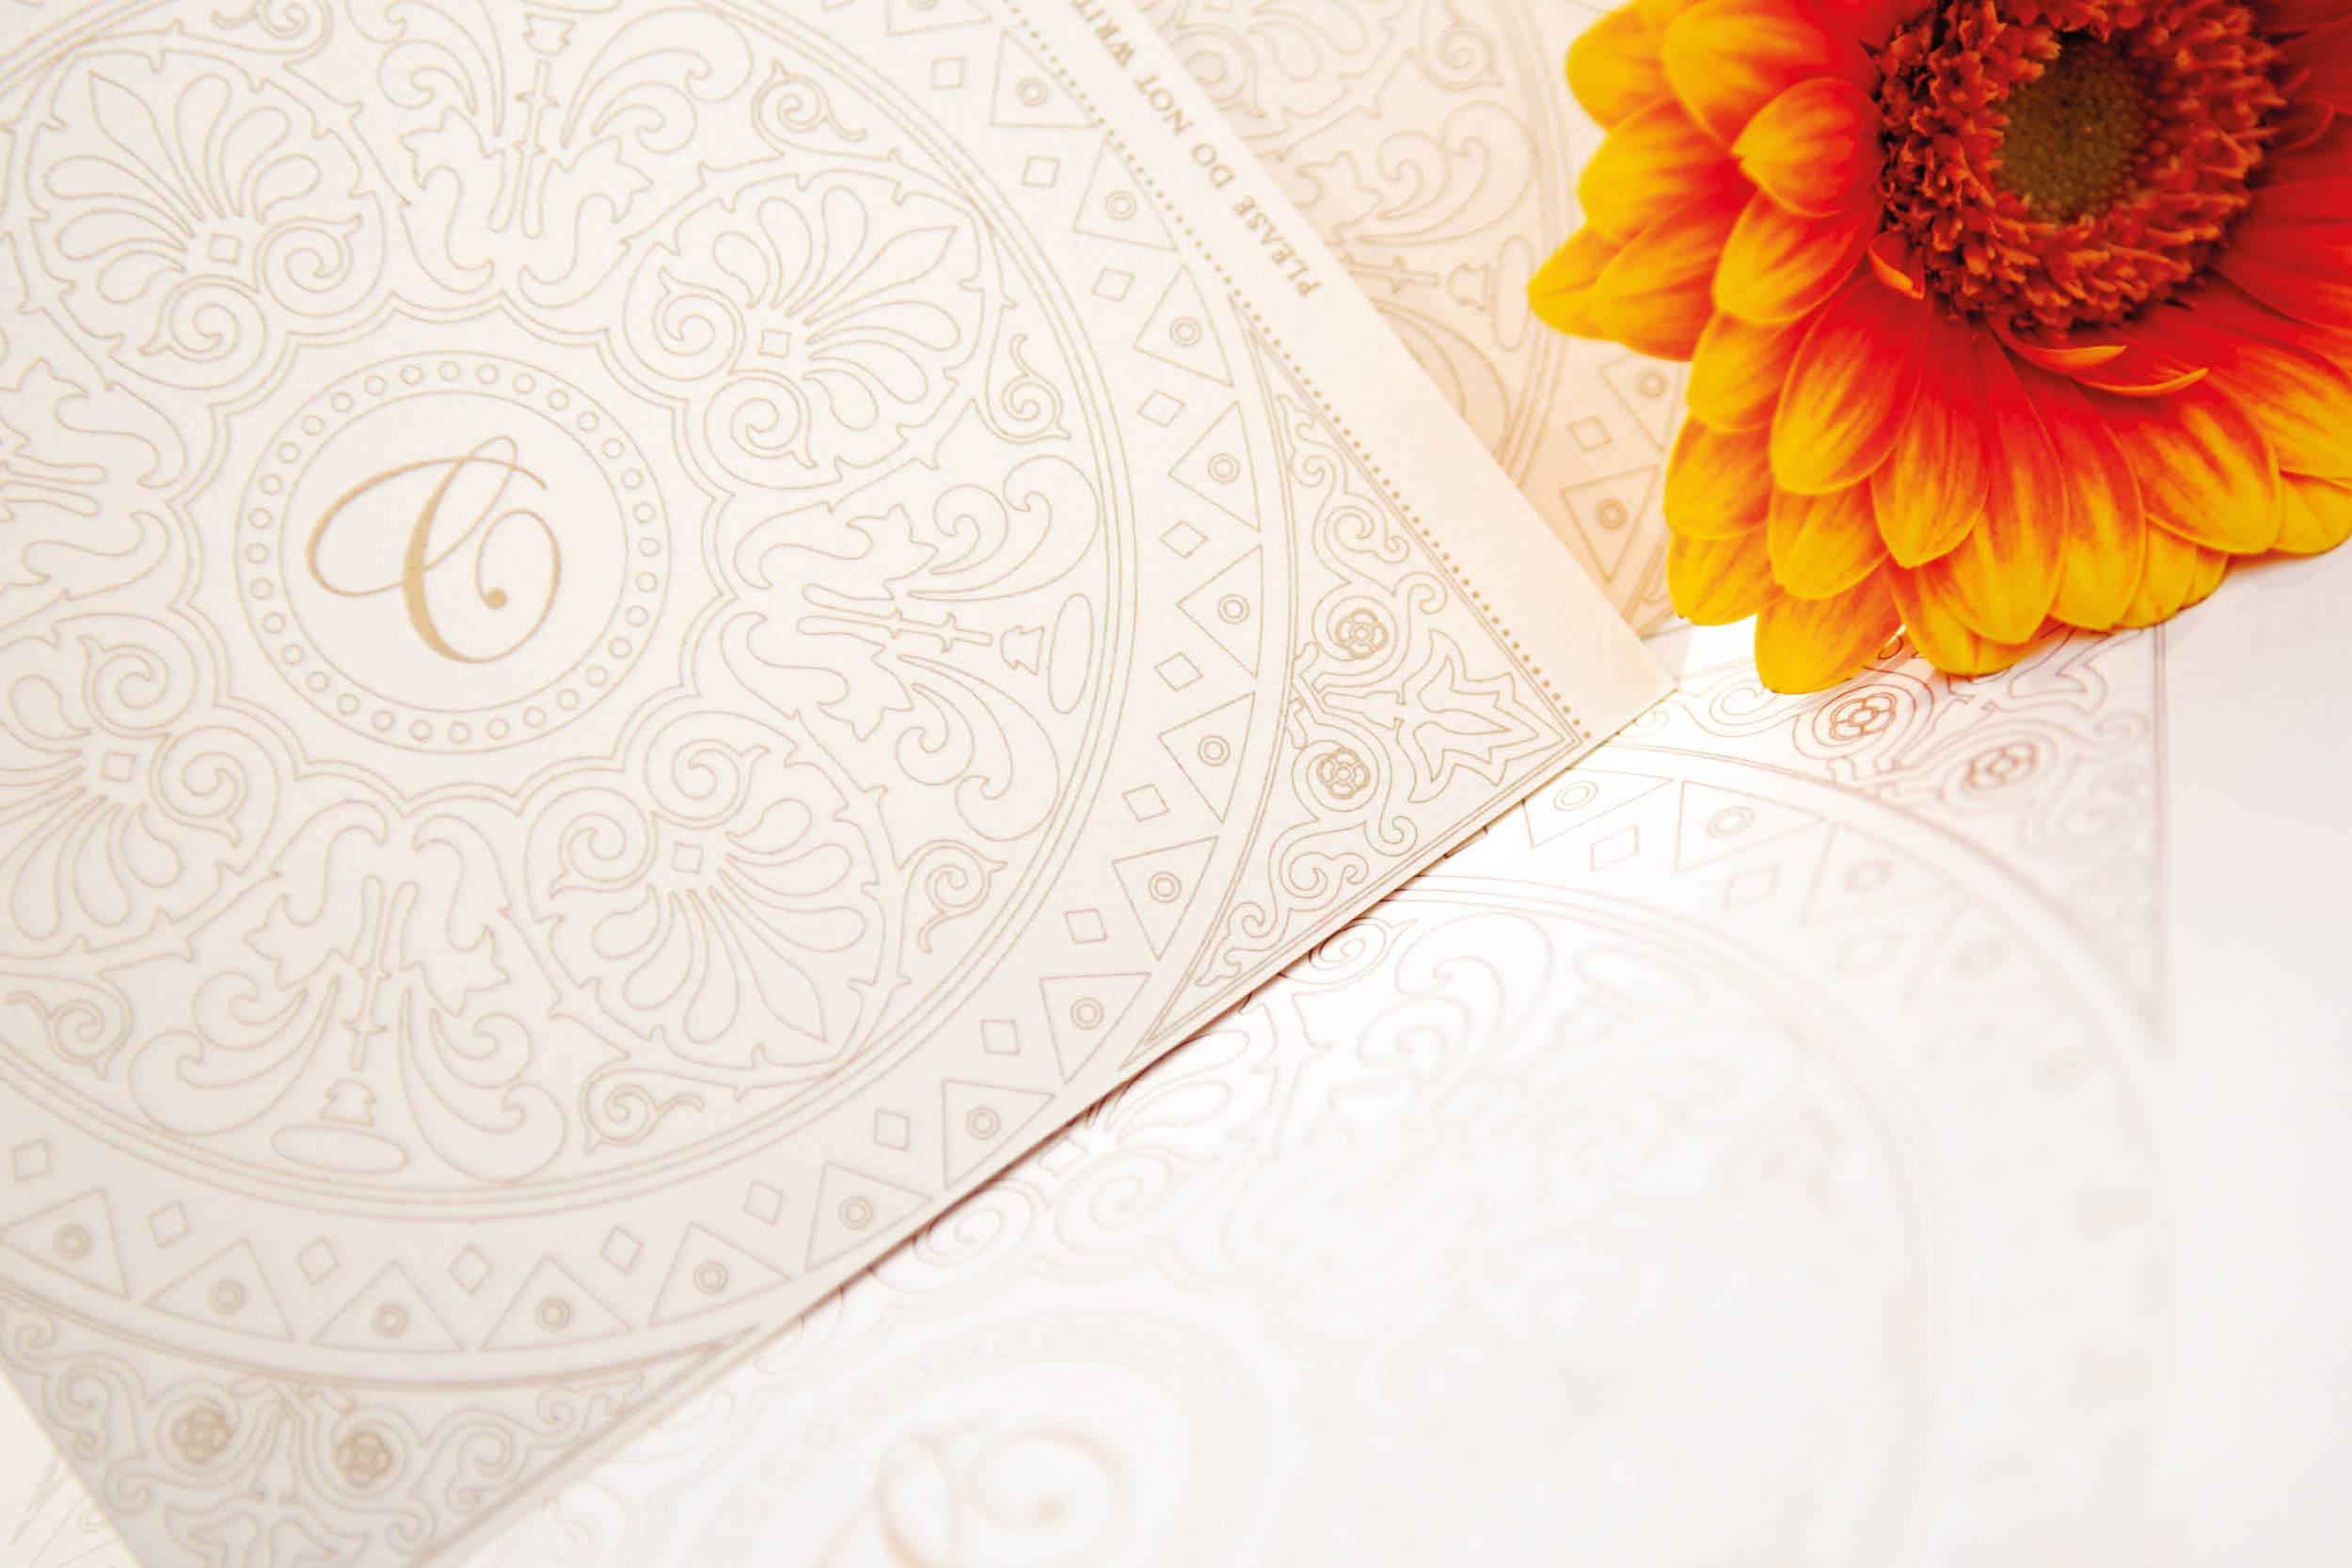 Exotica_bespoke wedding invite_ananyacards.com-01.jpg